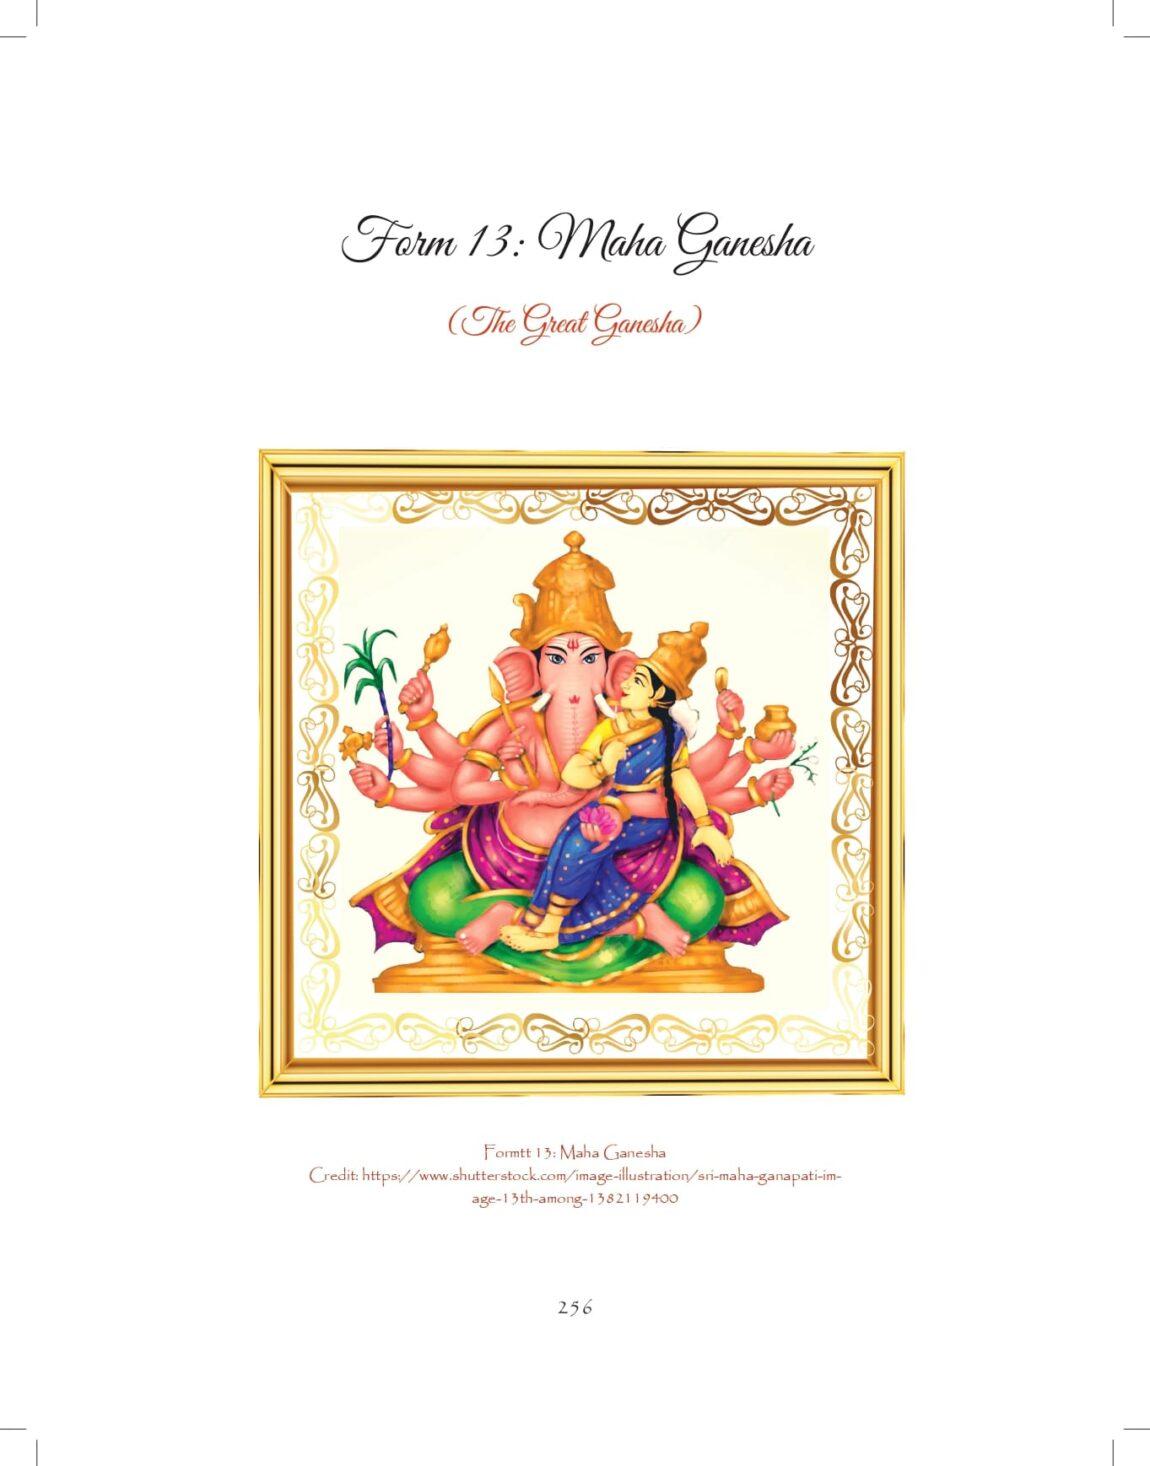 Ganesh-print_pages-to-jpg-0256.jpg